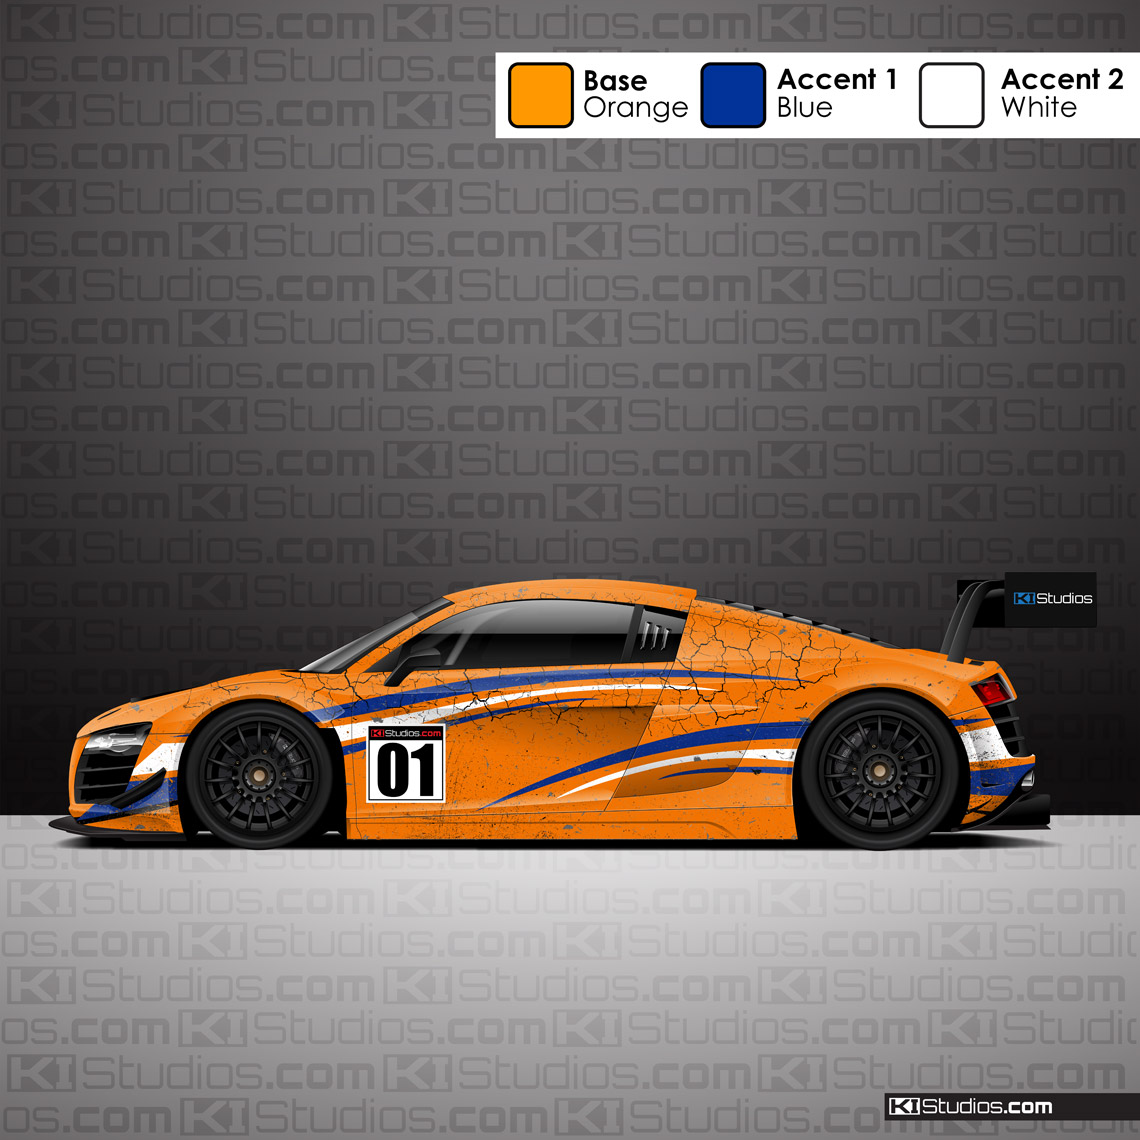 Racing Livery Distressed Performance Car Wrap - Arid